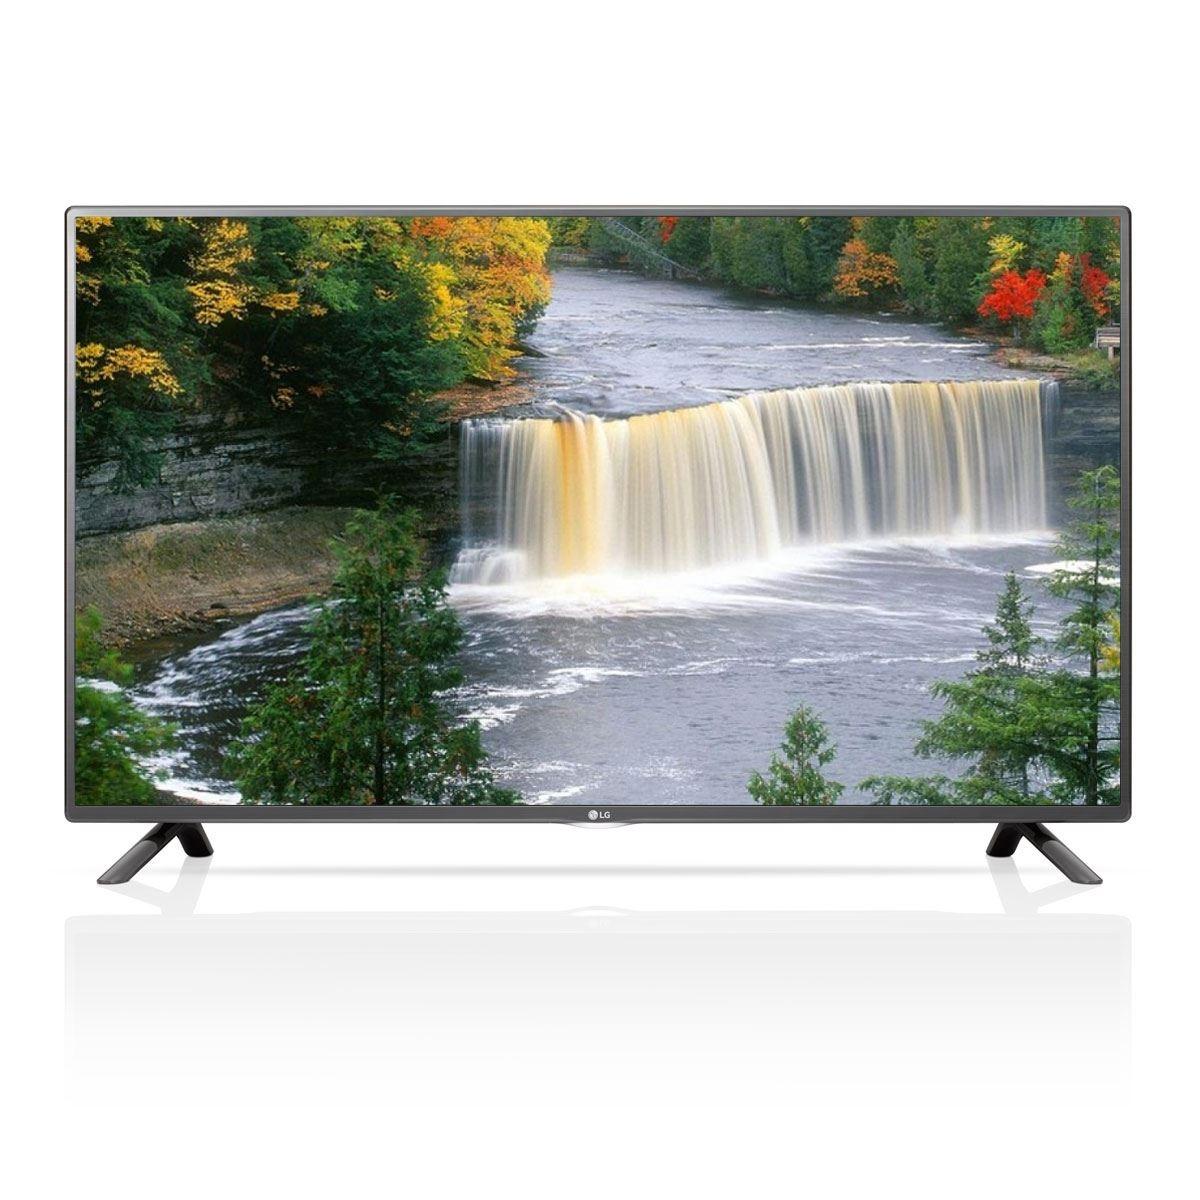 LG 60inch 6100 Series LED HDTV - 60LF6100